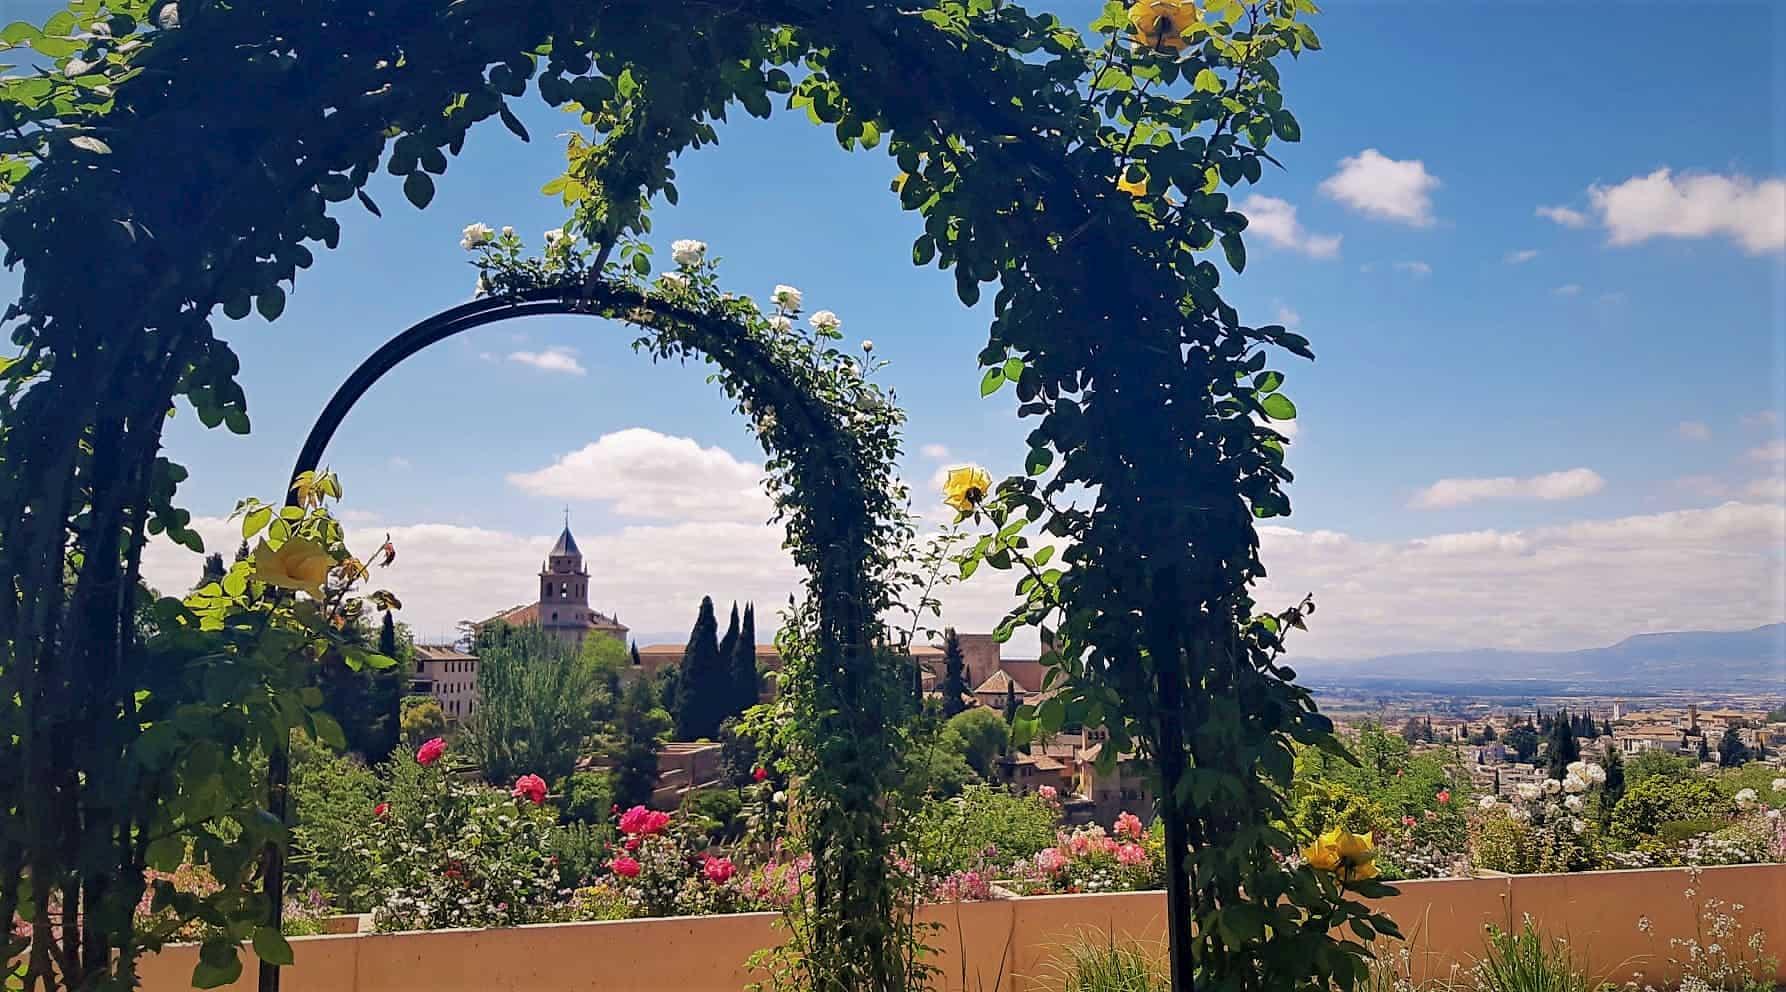 Jardines del Generalife de la Alhambra de Granada